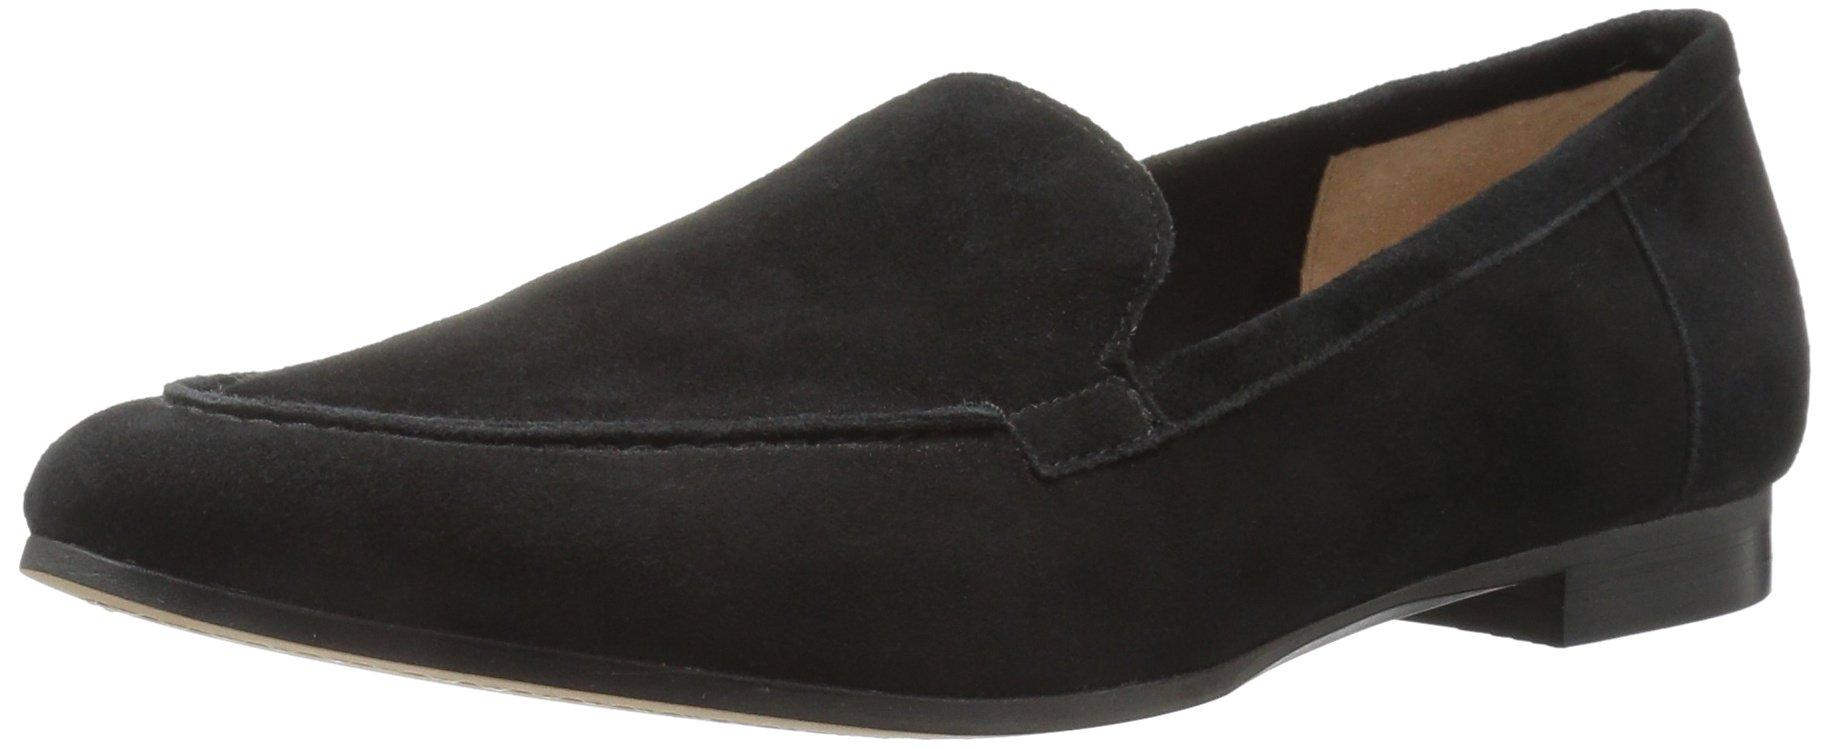 206 Collective Women's Leona Slip-on Loafer, Black, 8.5 B US